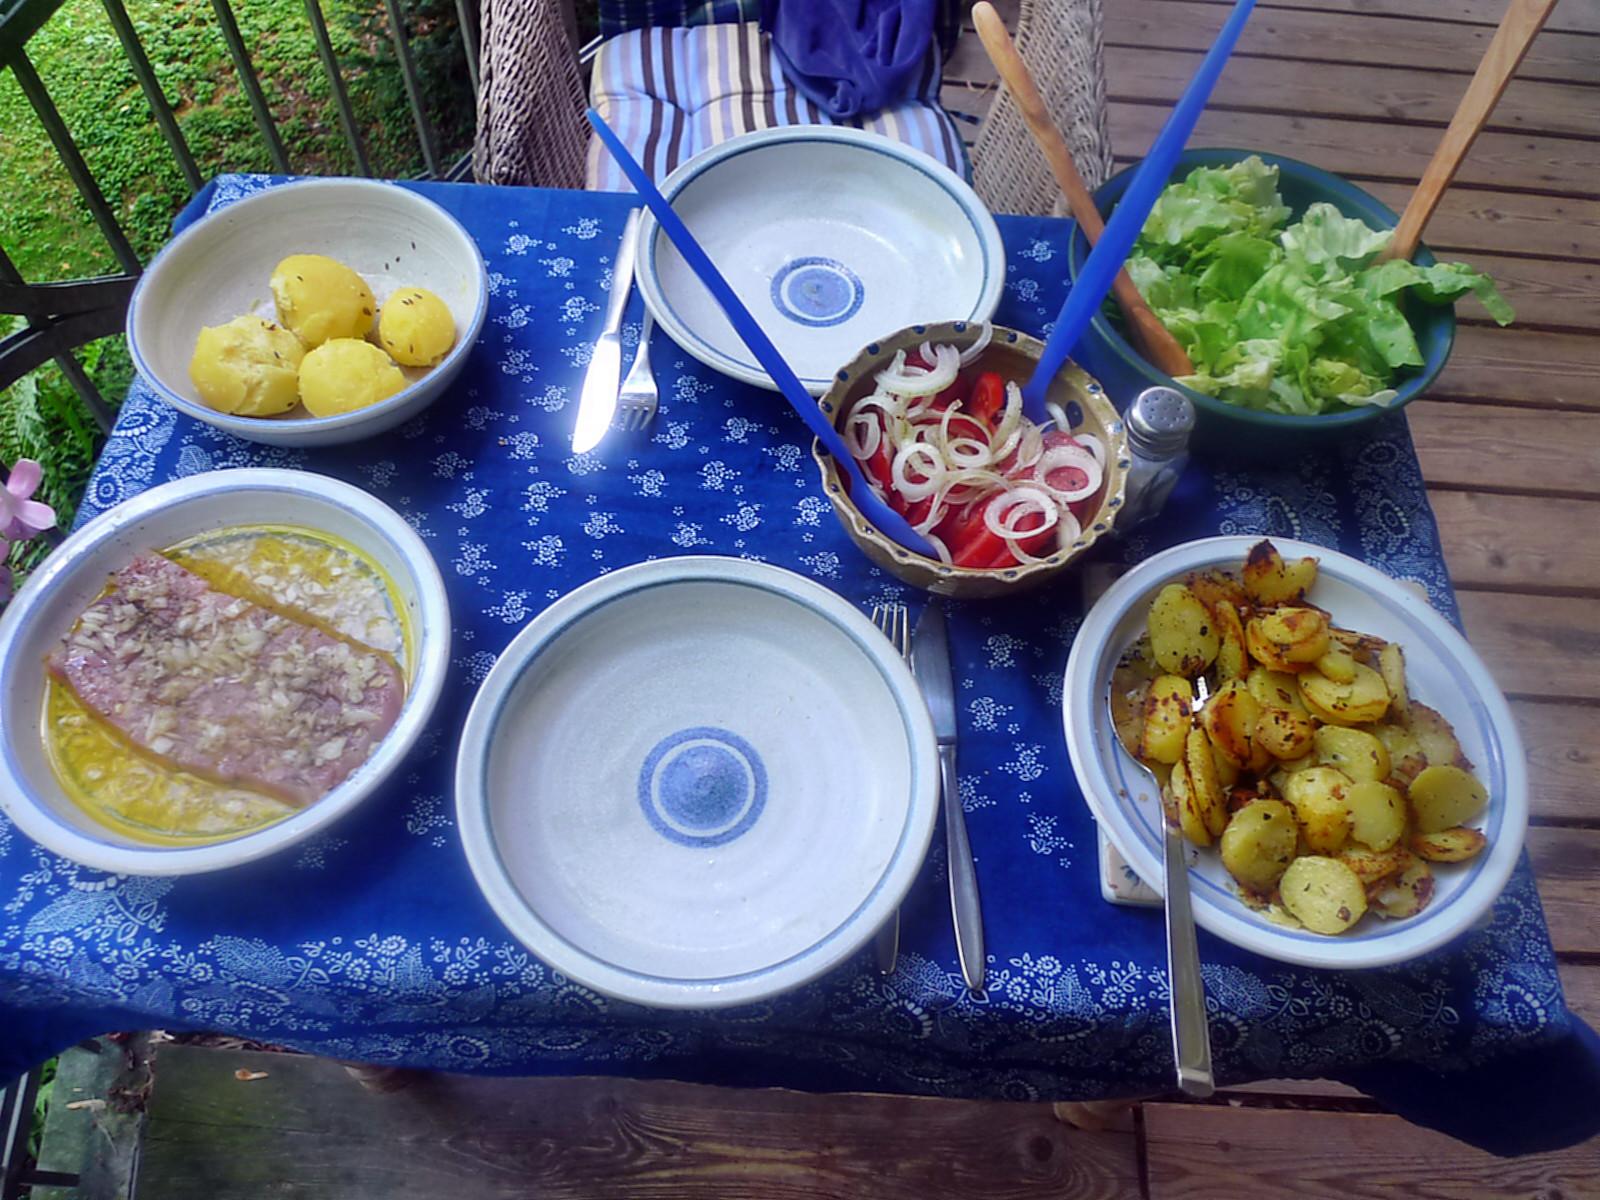 Sülze-Matjes-Bratkartiffel-Salate-12.8 (6)